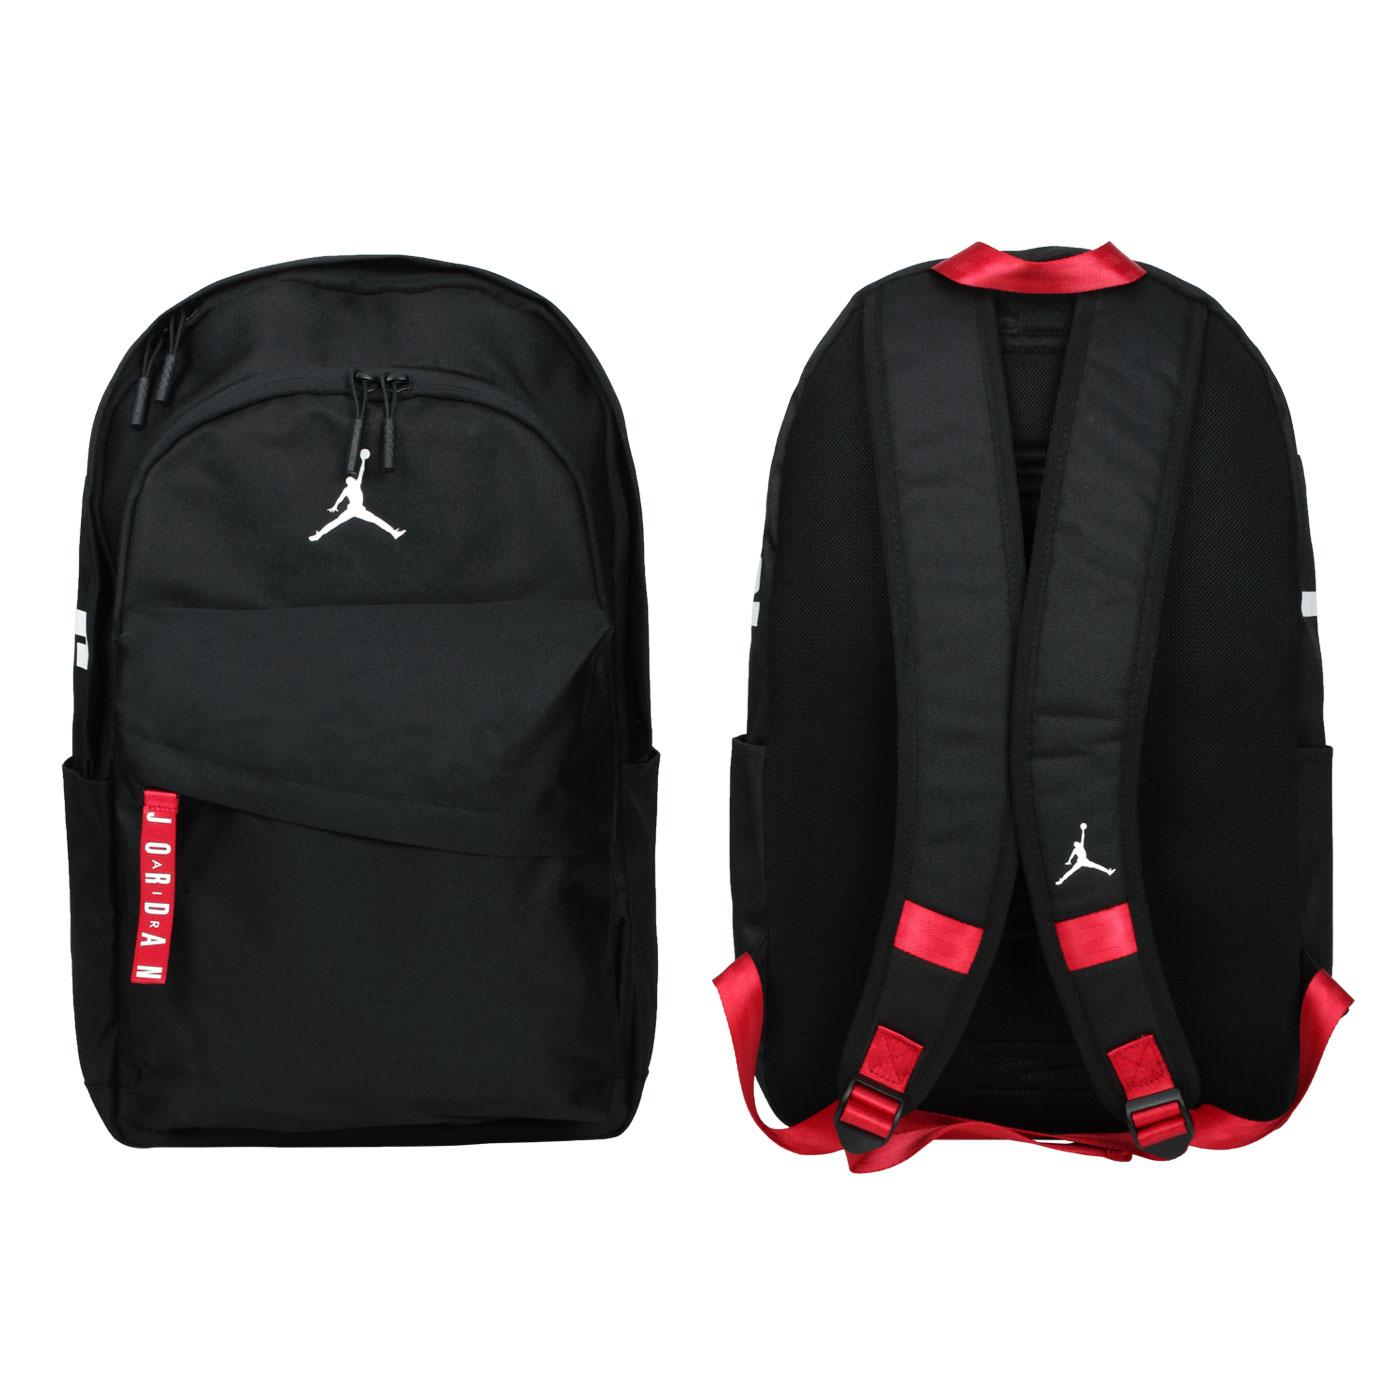 NIKE 大型雙肩包 JD2033001AD-001 - 黑紅白